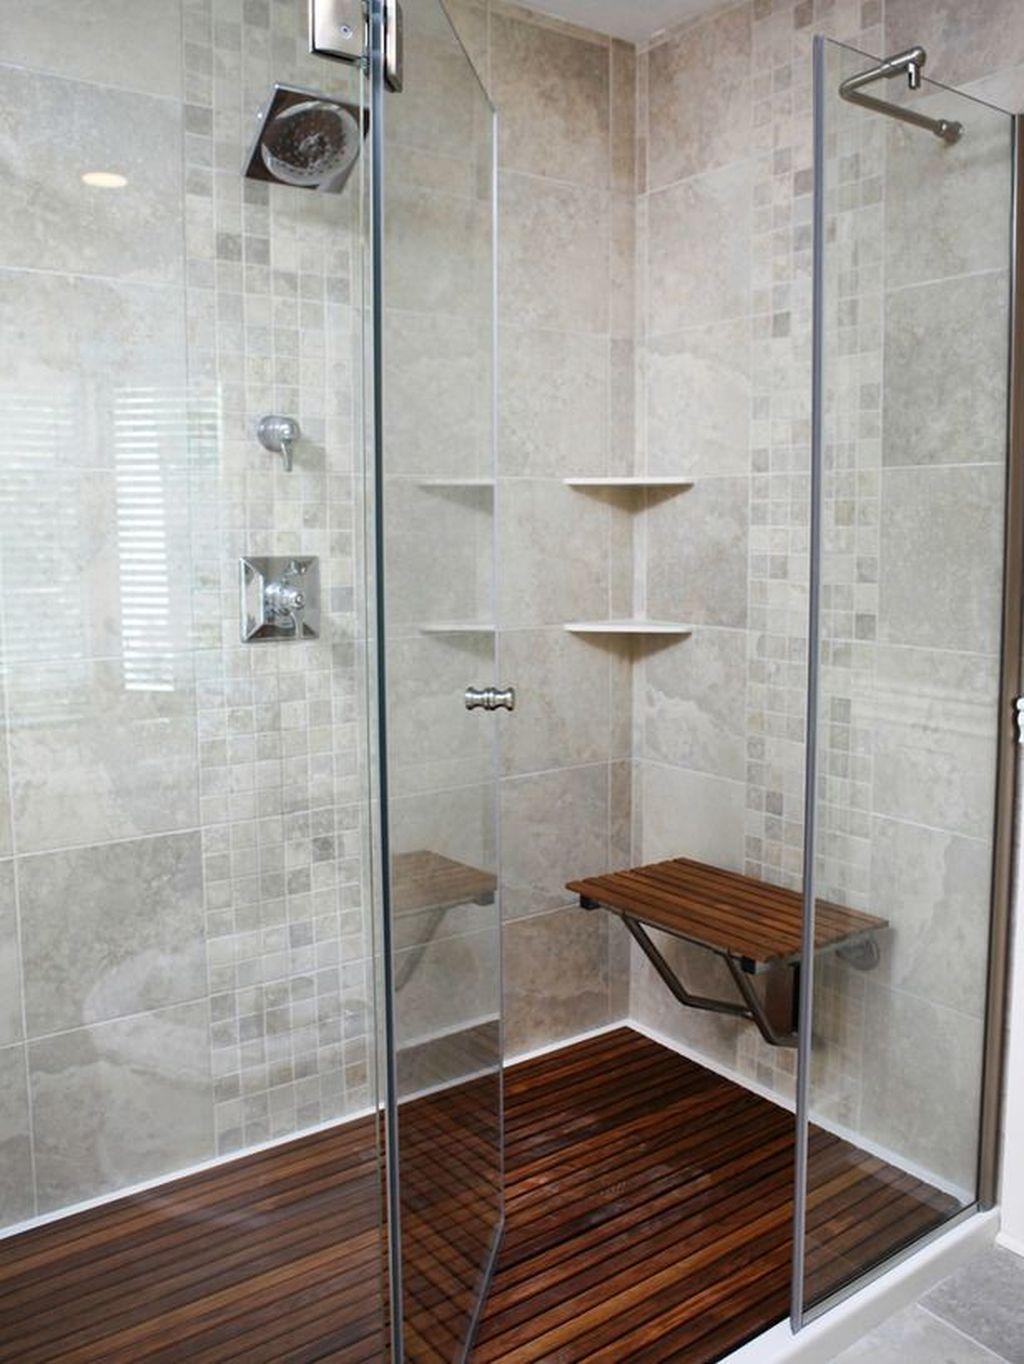 Marvelous Wooden Shower Floor Tiles Designs Ideas For Bathroom Remodel 08